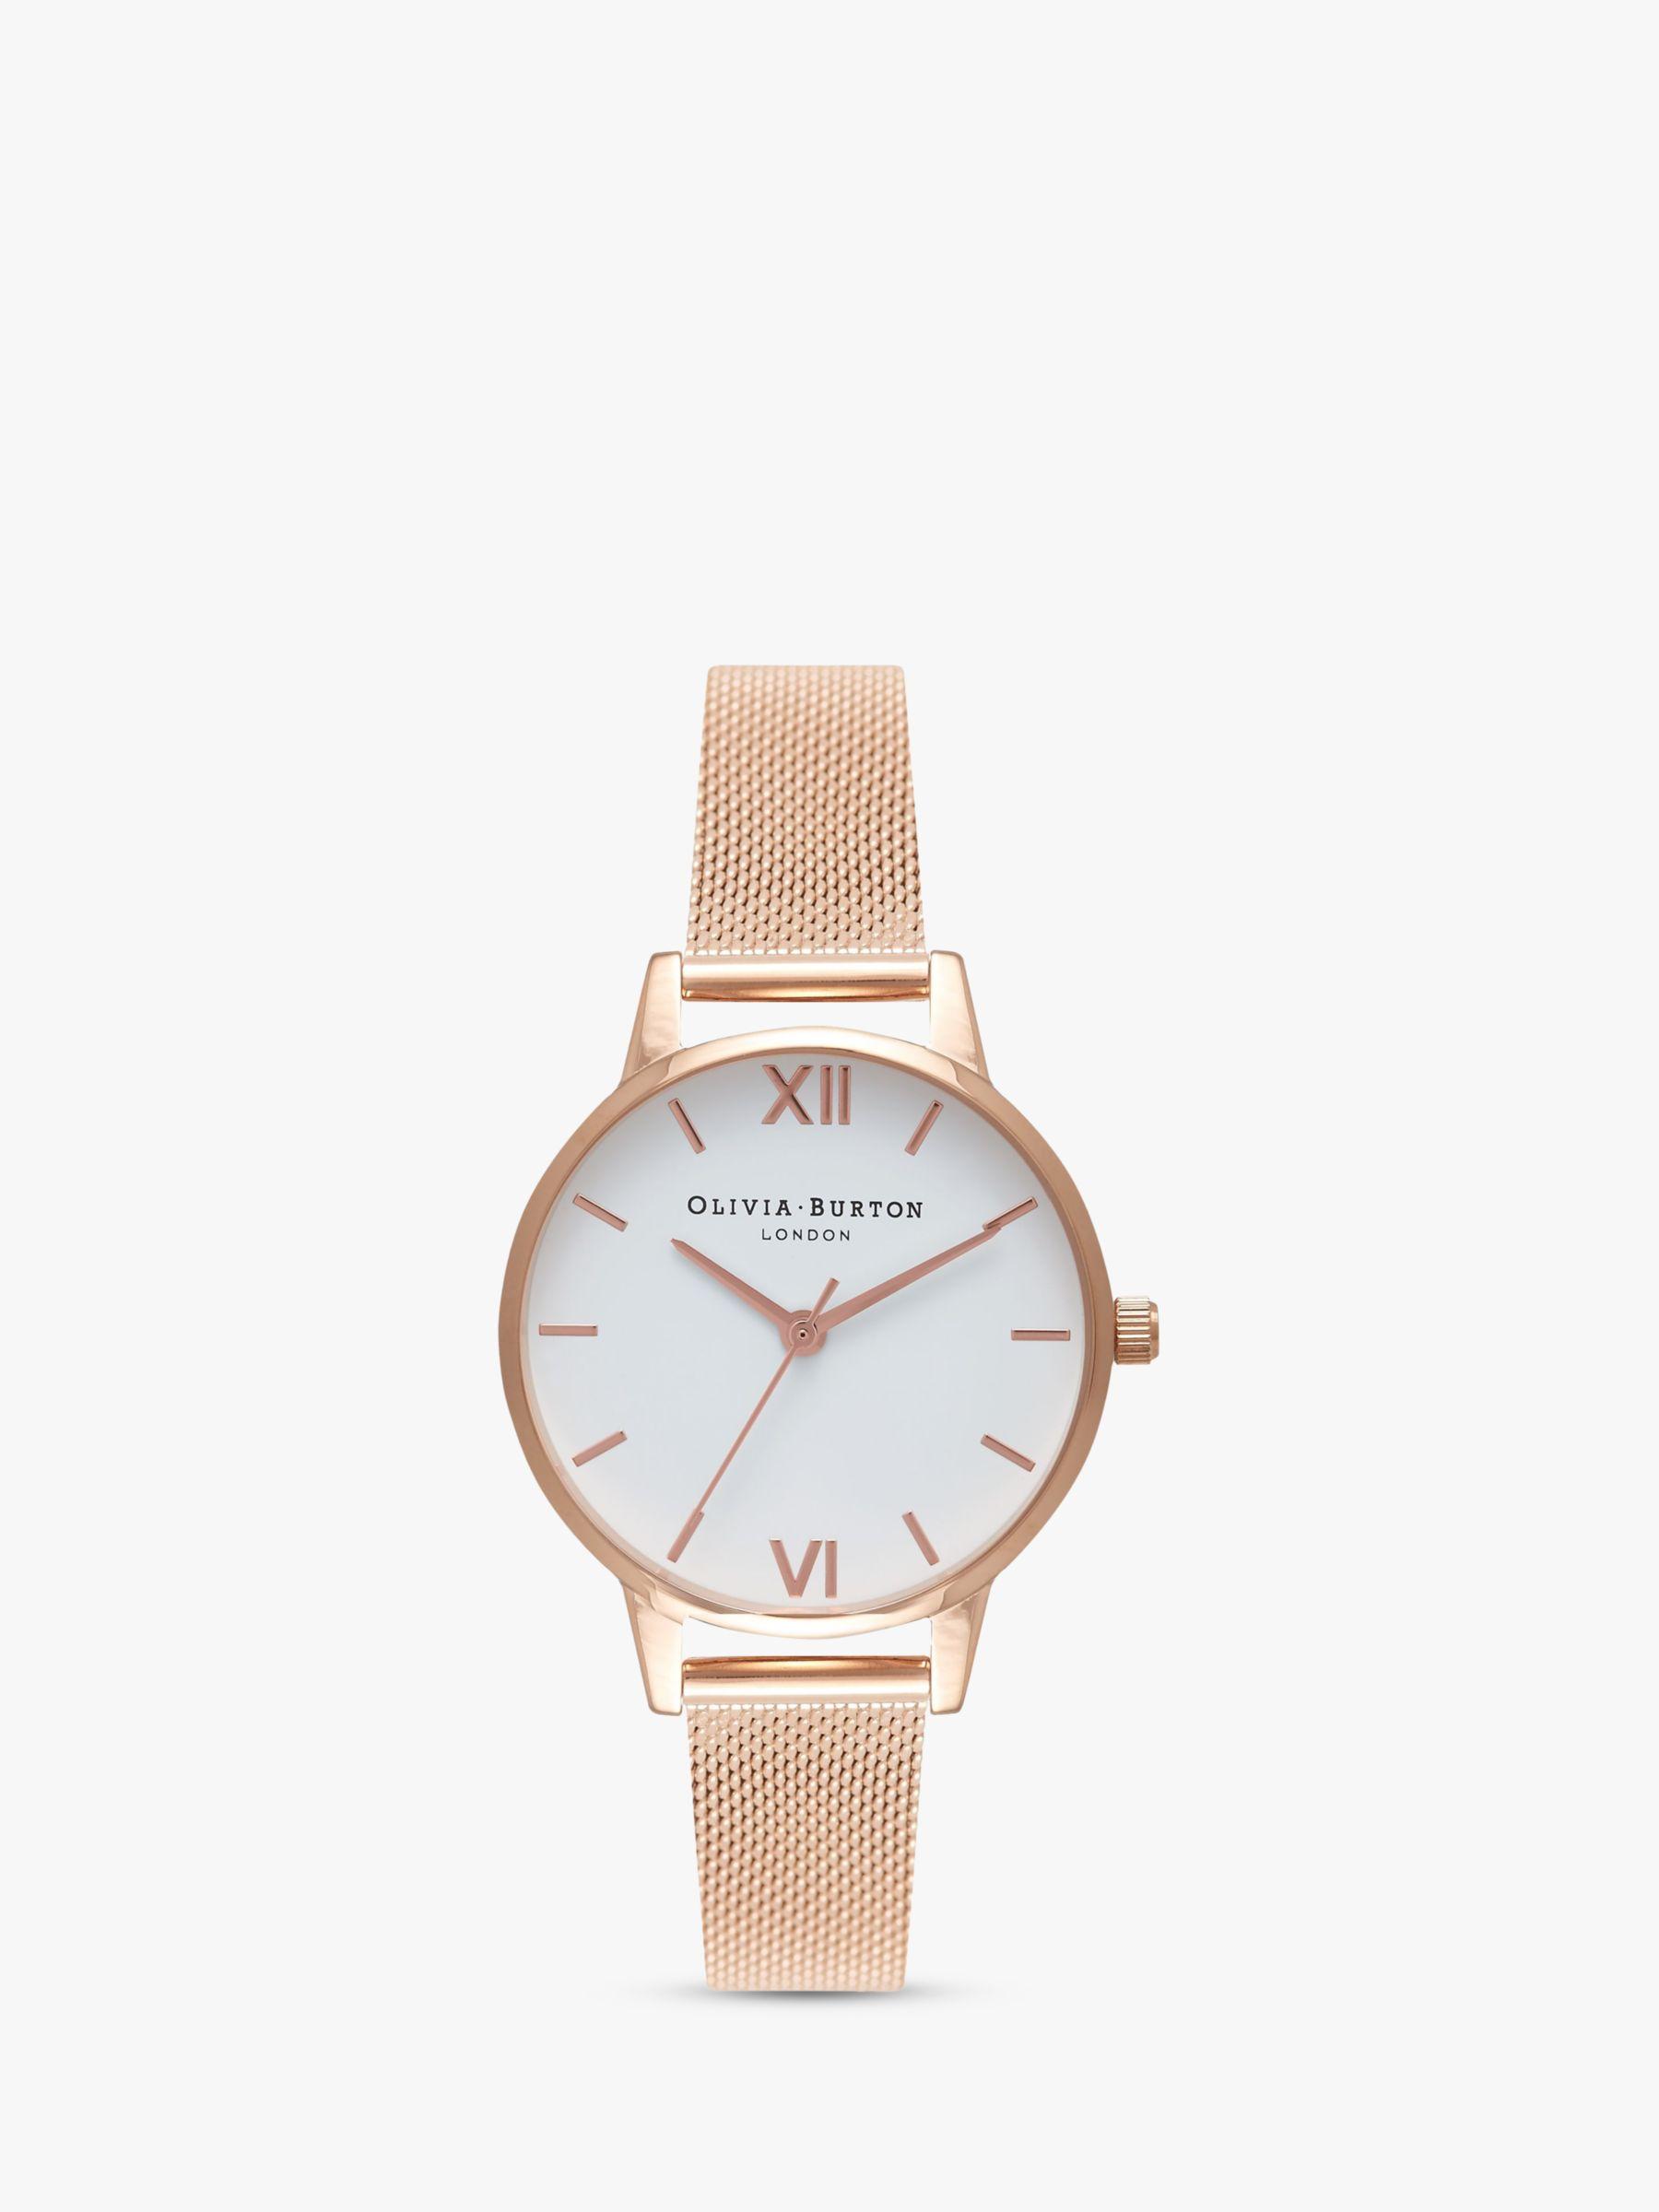 Olivia Burton Olivia Burton Women's White Dial Mesh Bracelet Strap Watch, Rose Gold/White OB16MDW01